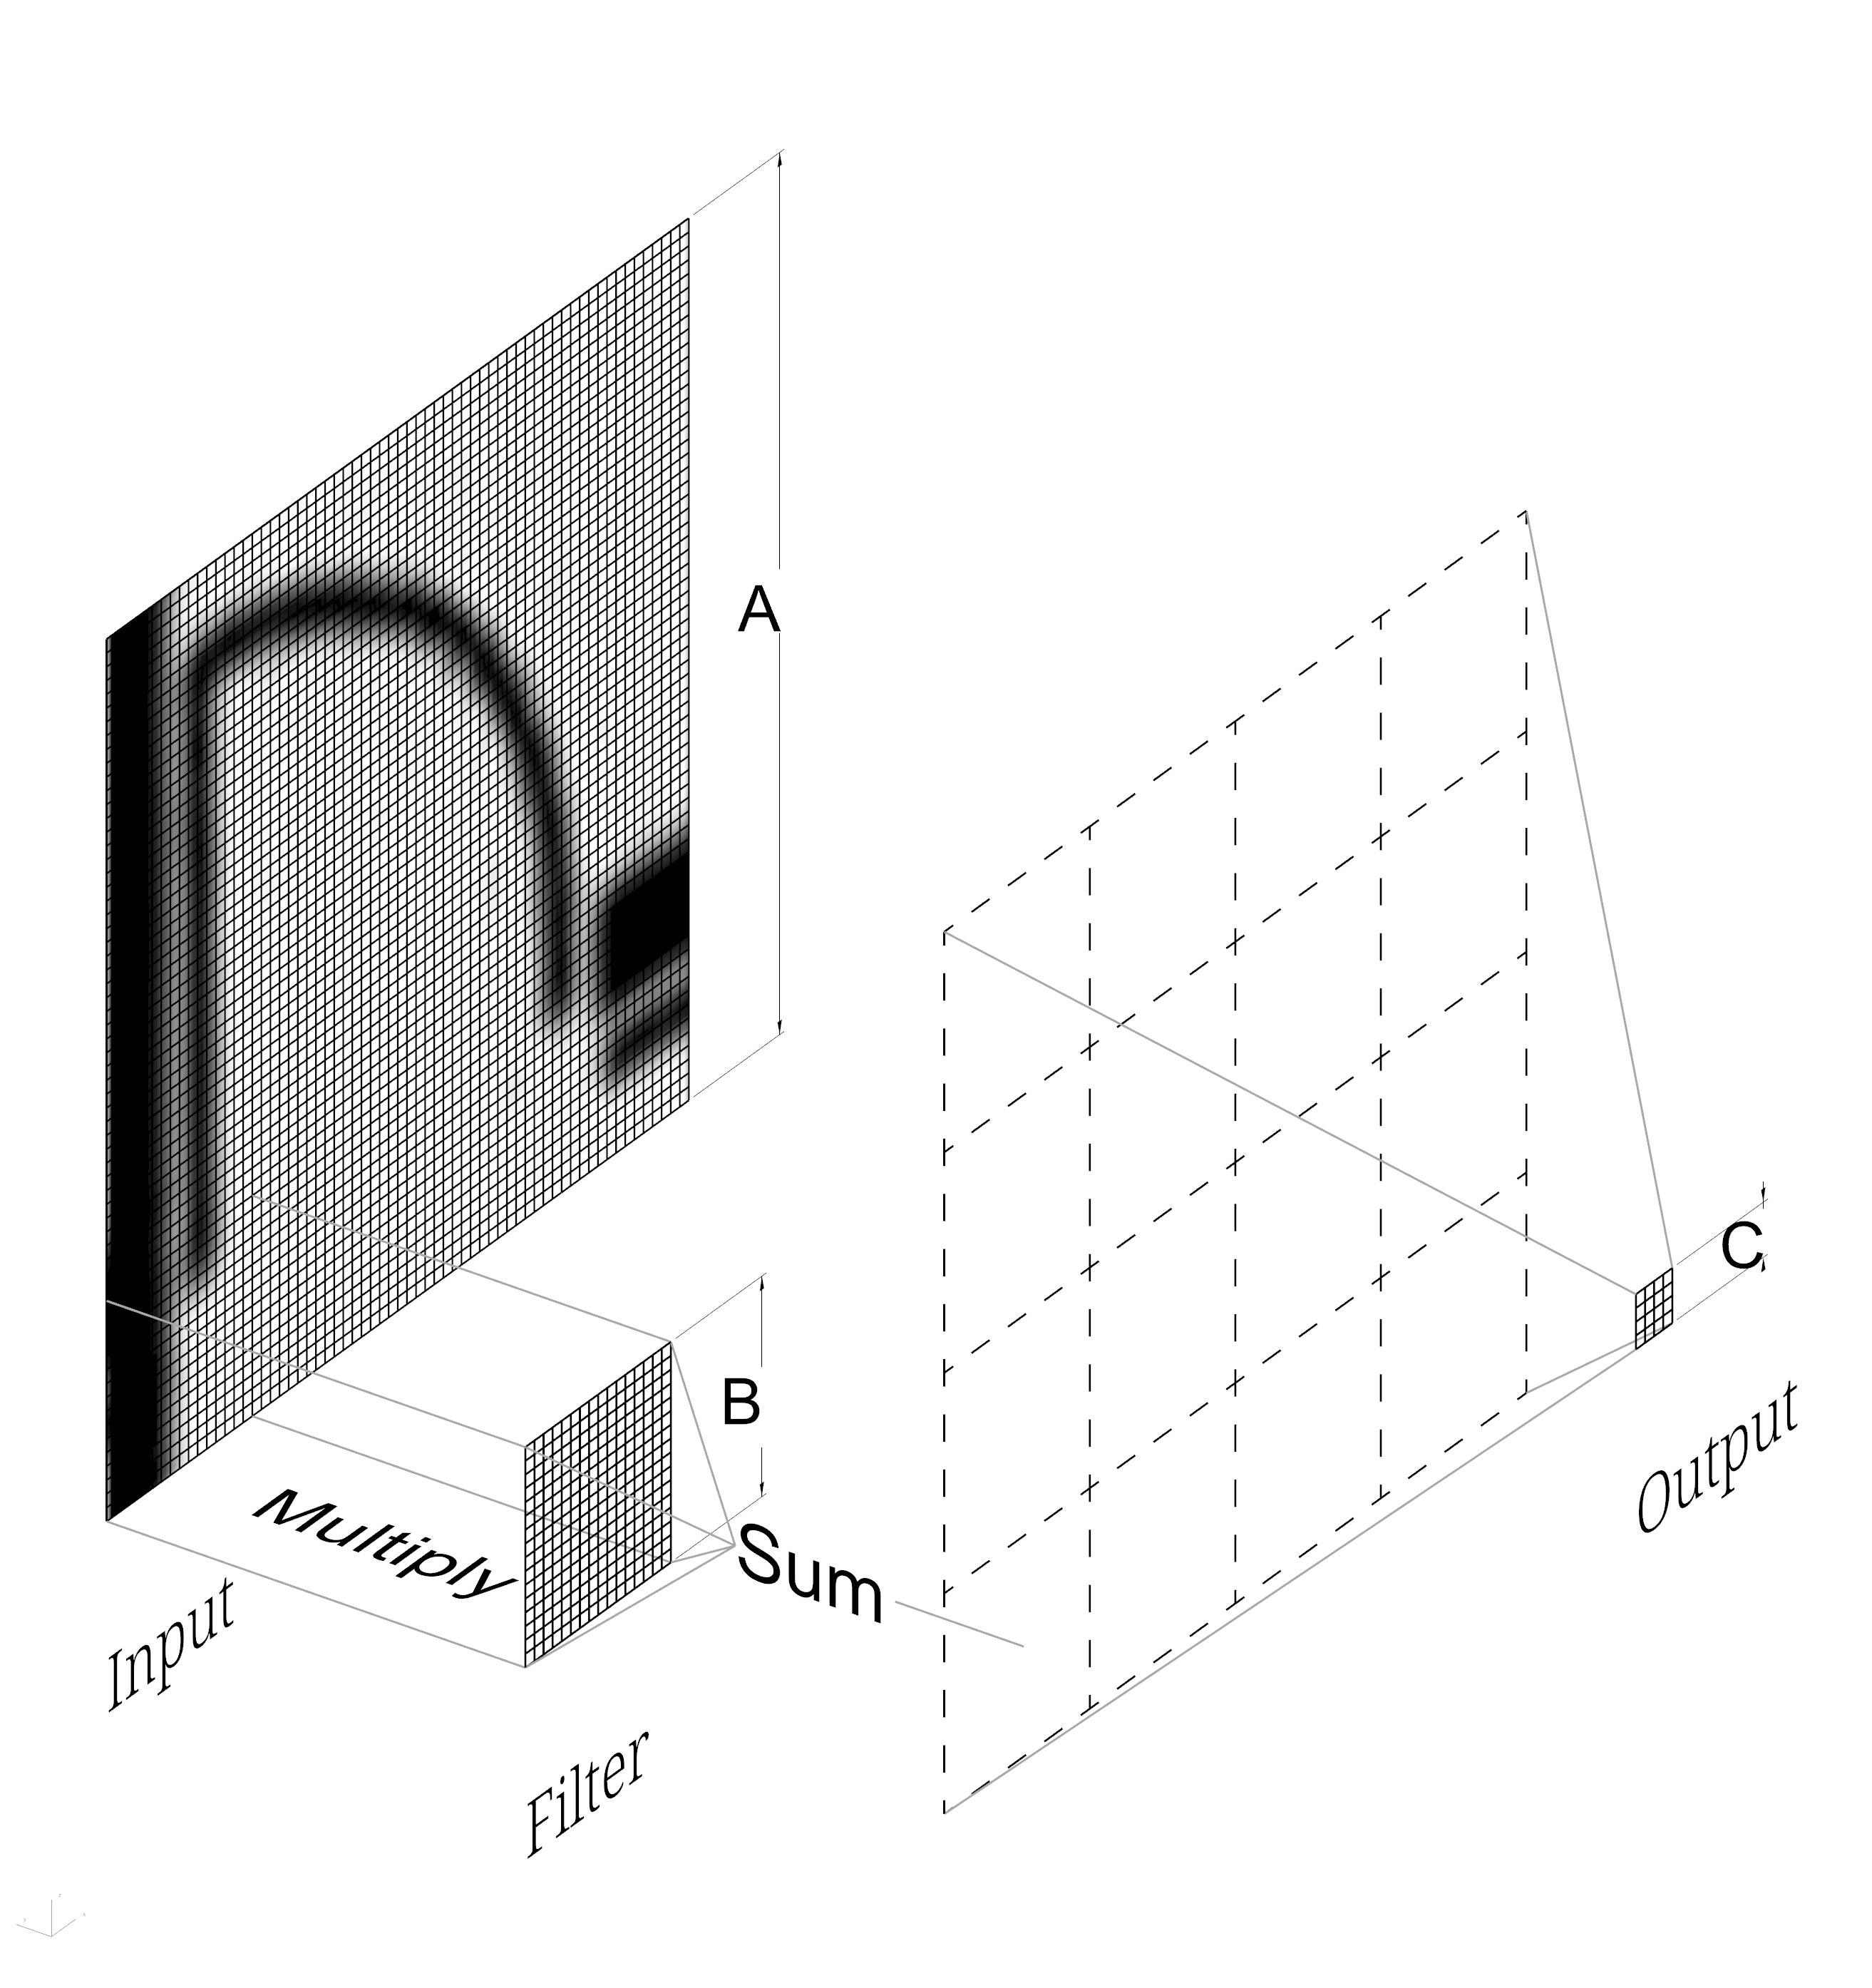 convolution-diagram